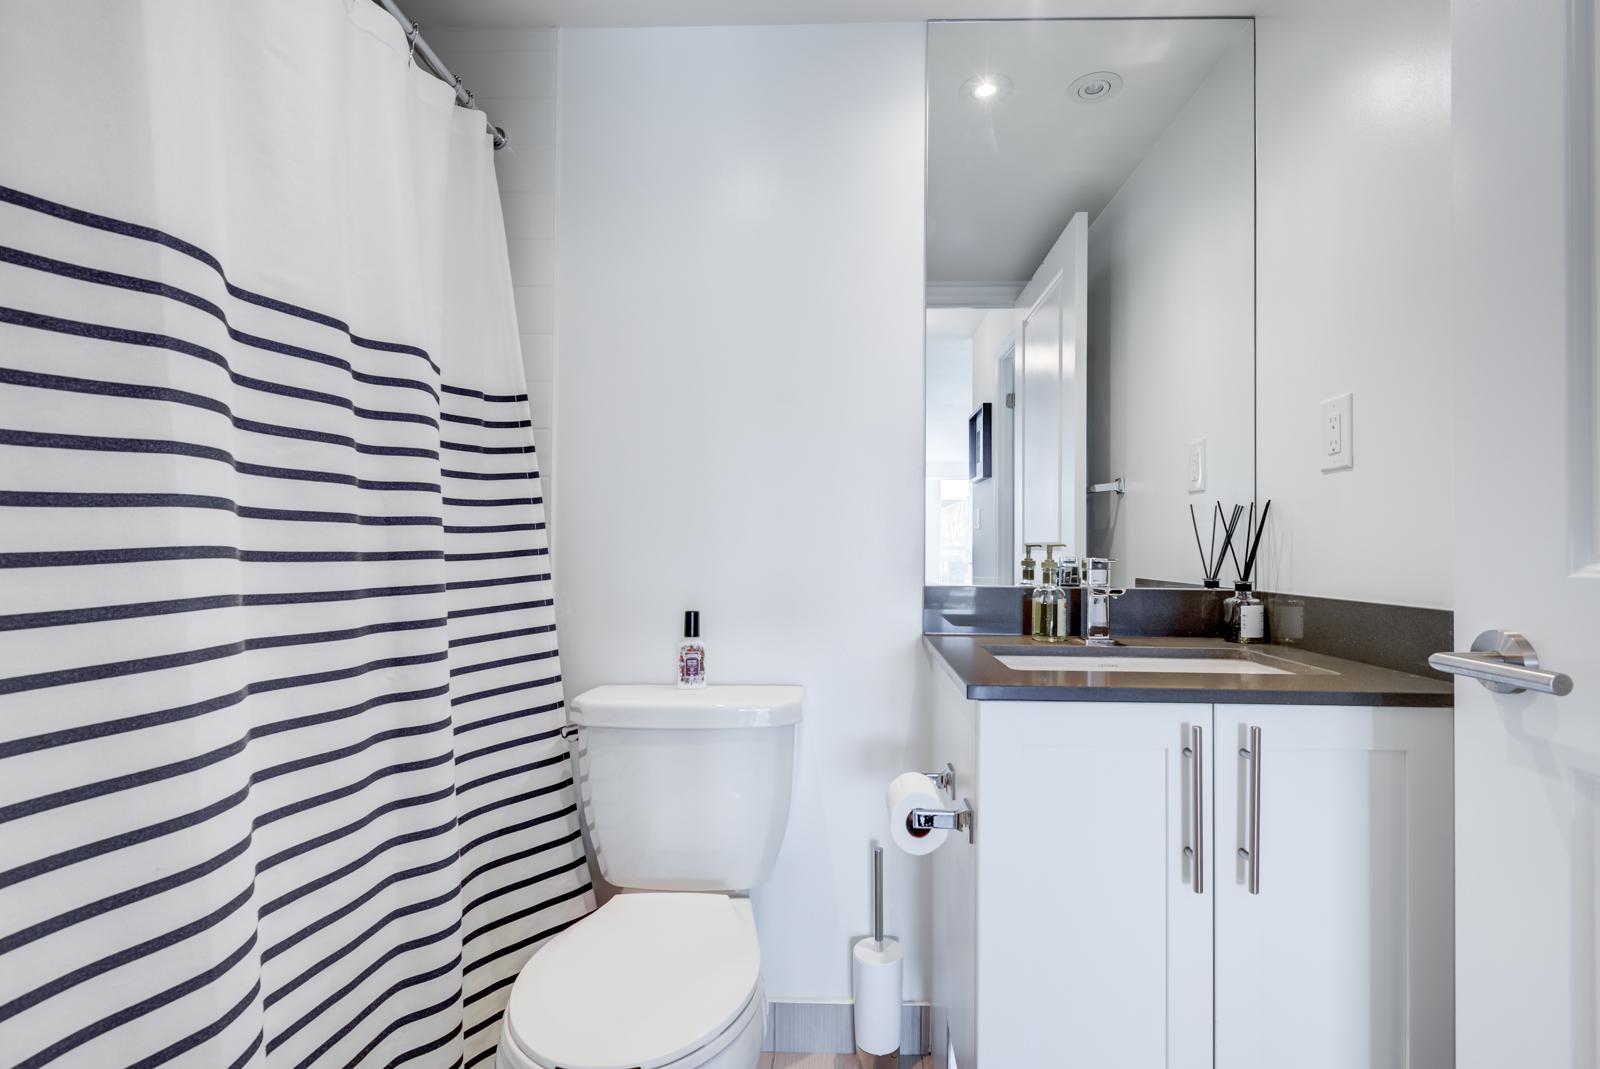 Bathroom in monochromes, striped shower curtain and sleek vanity.